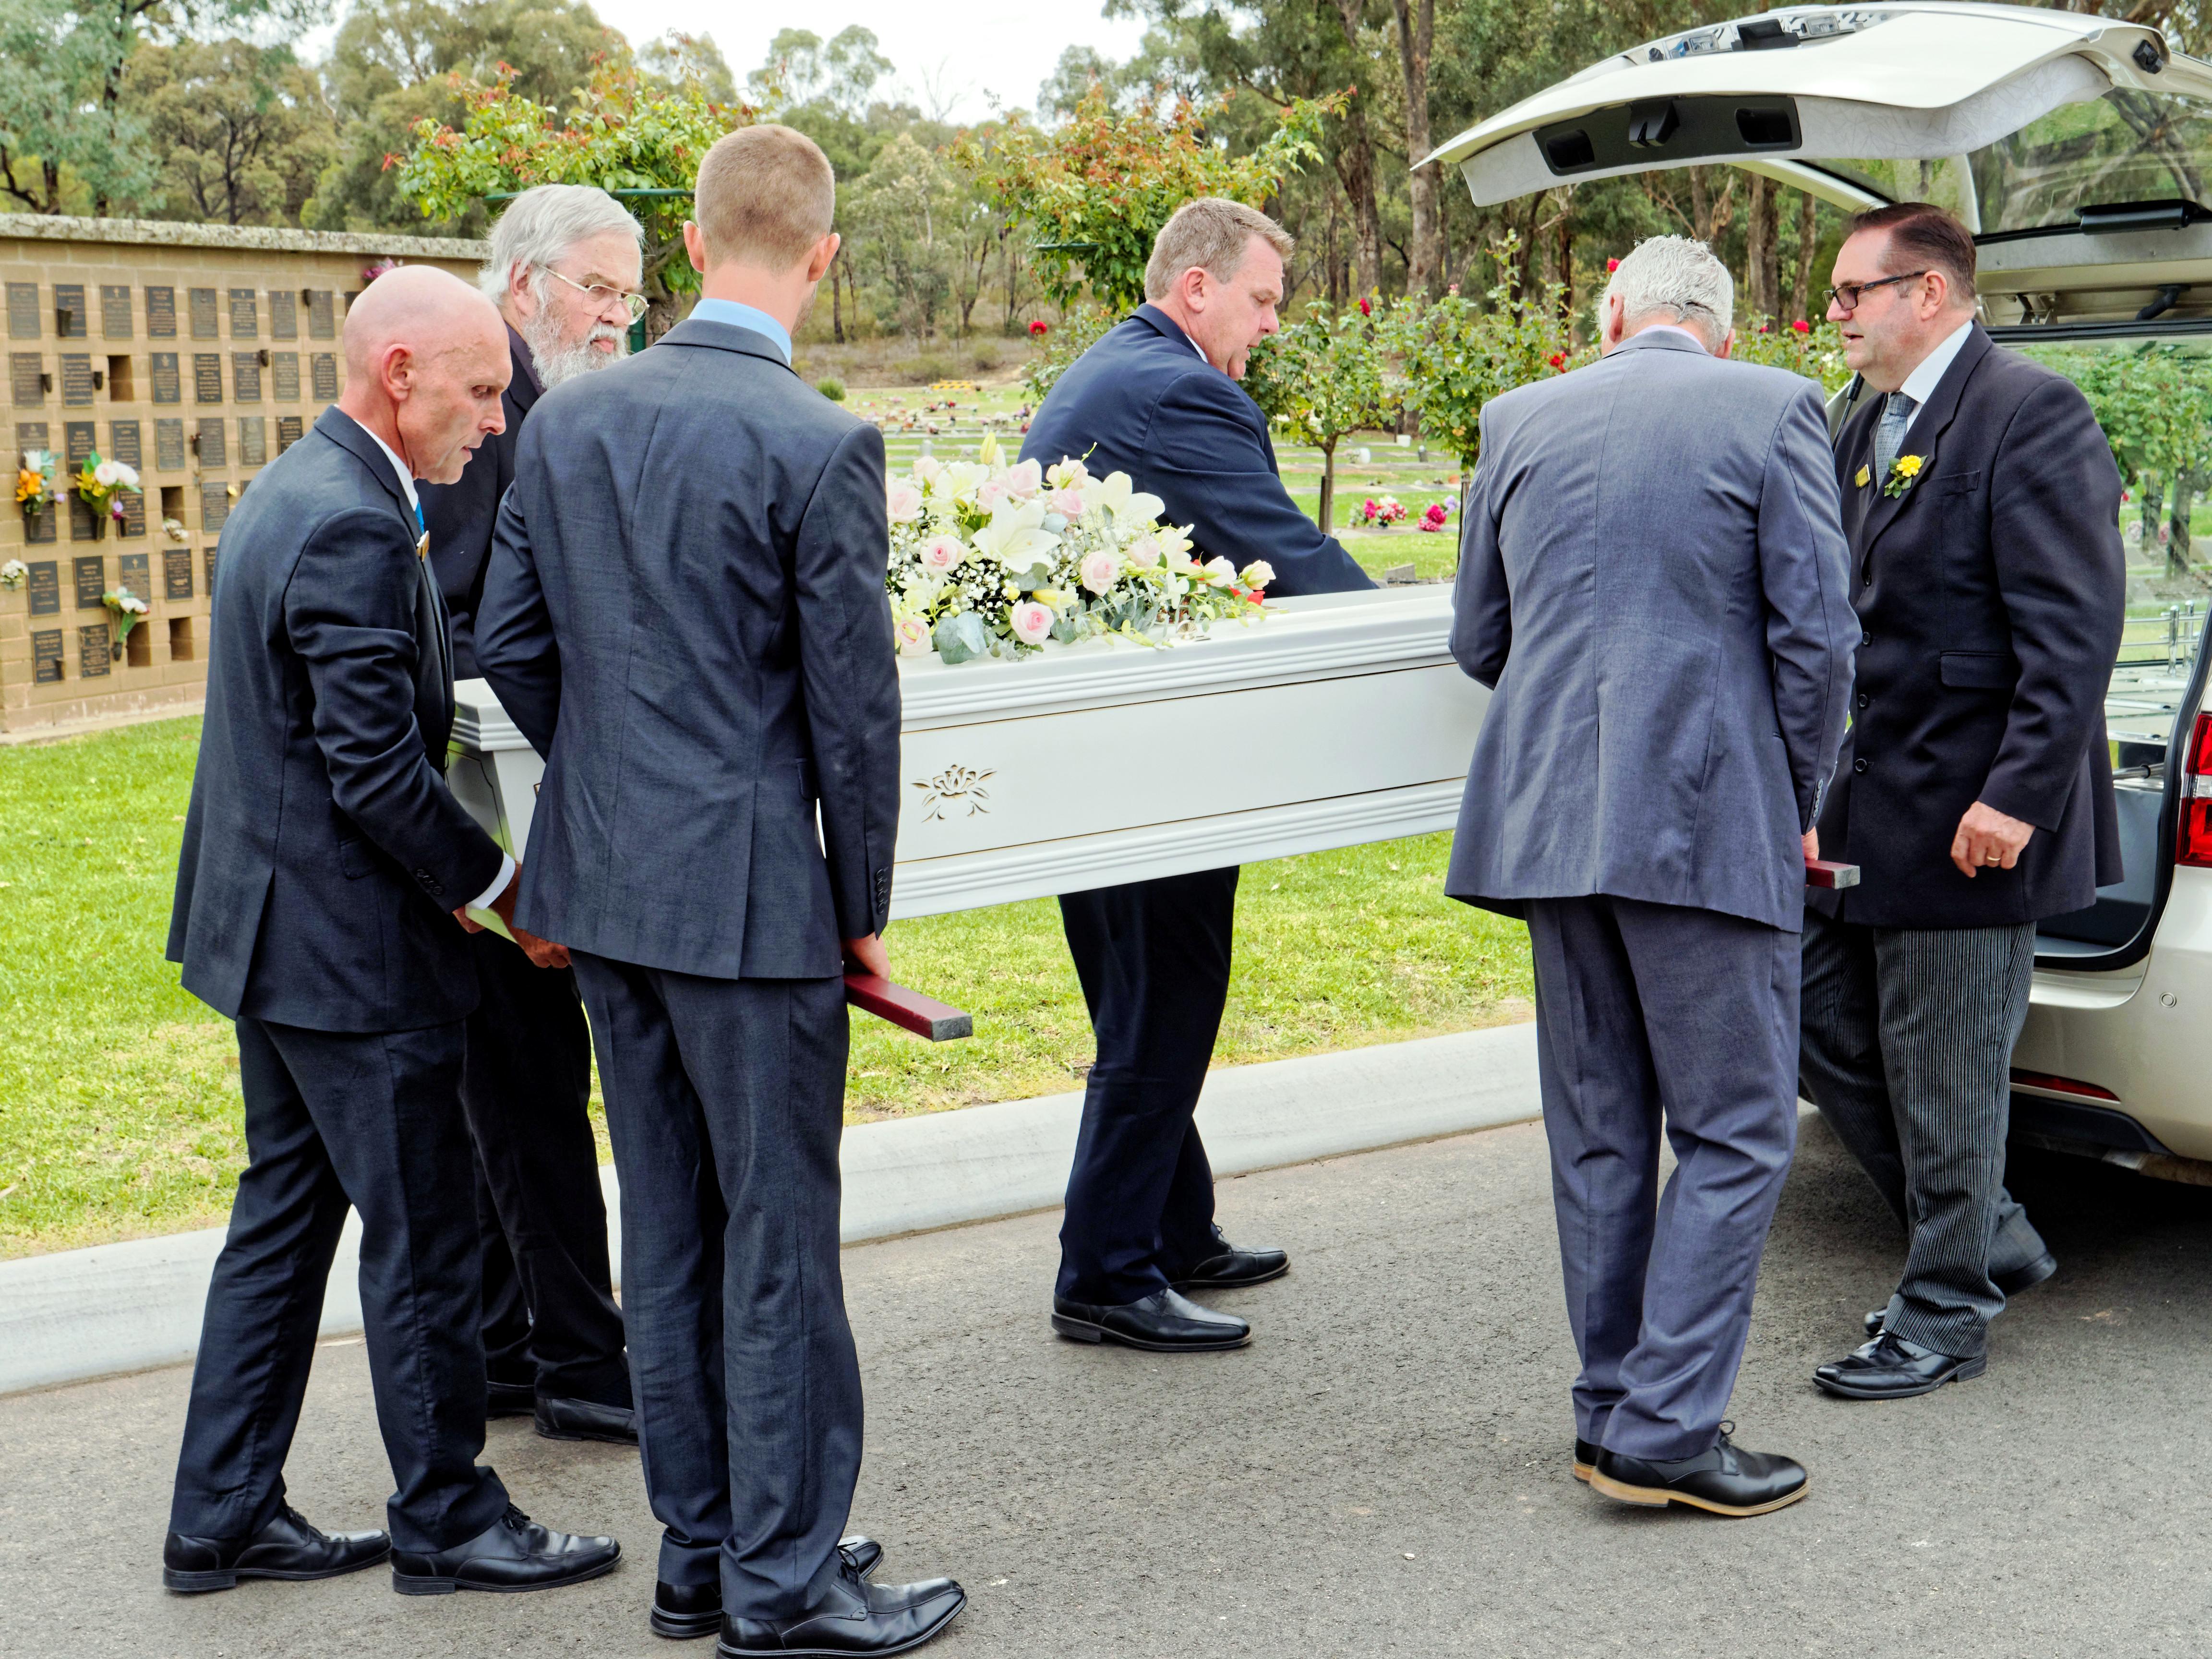 Funeral-35.jpeg